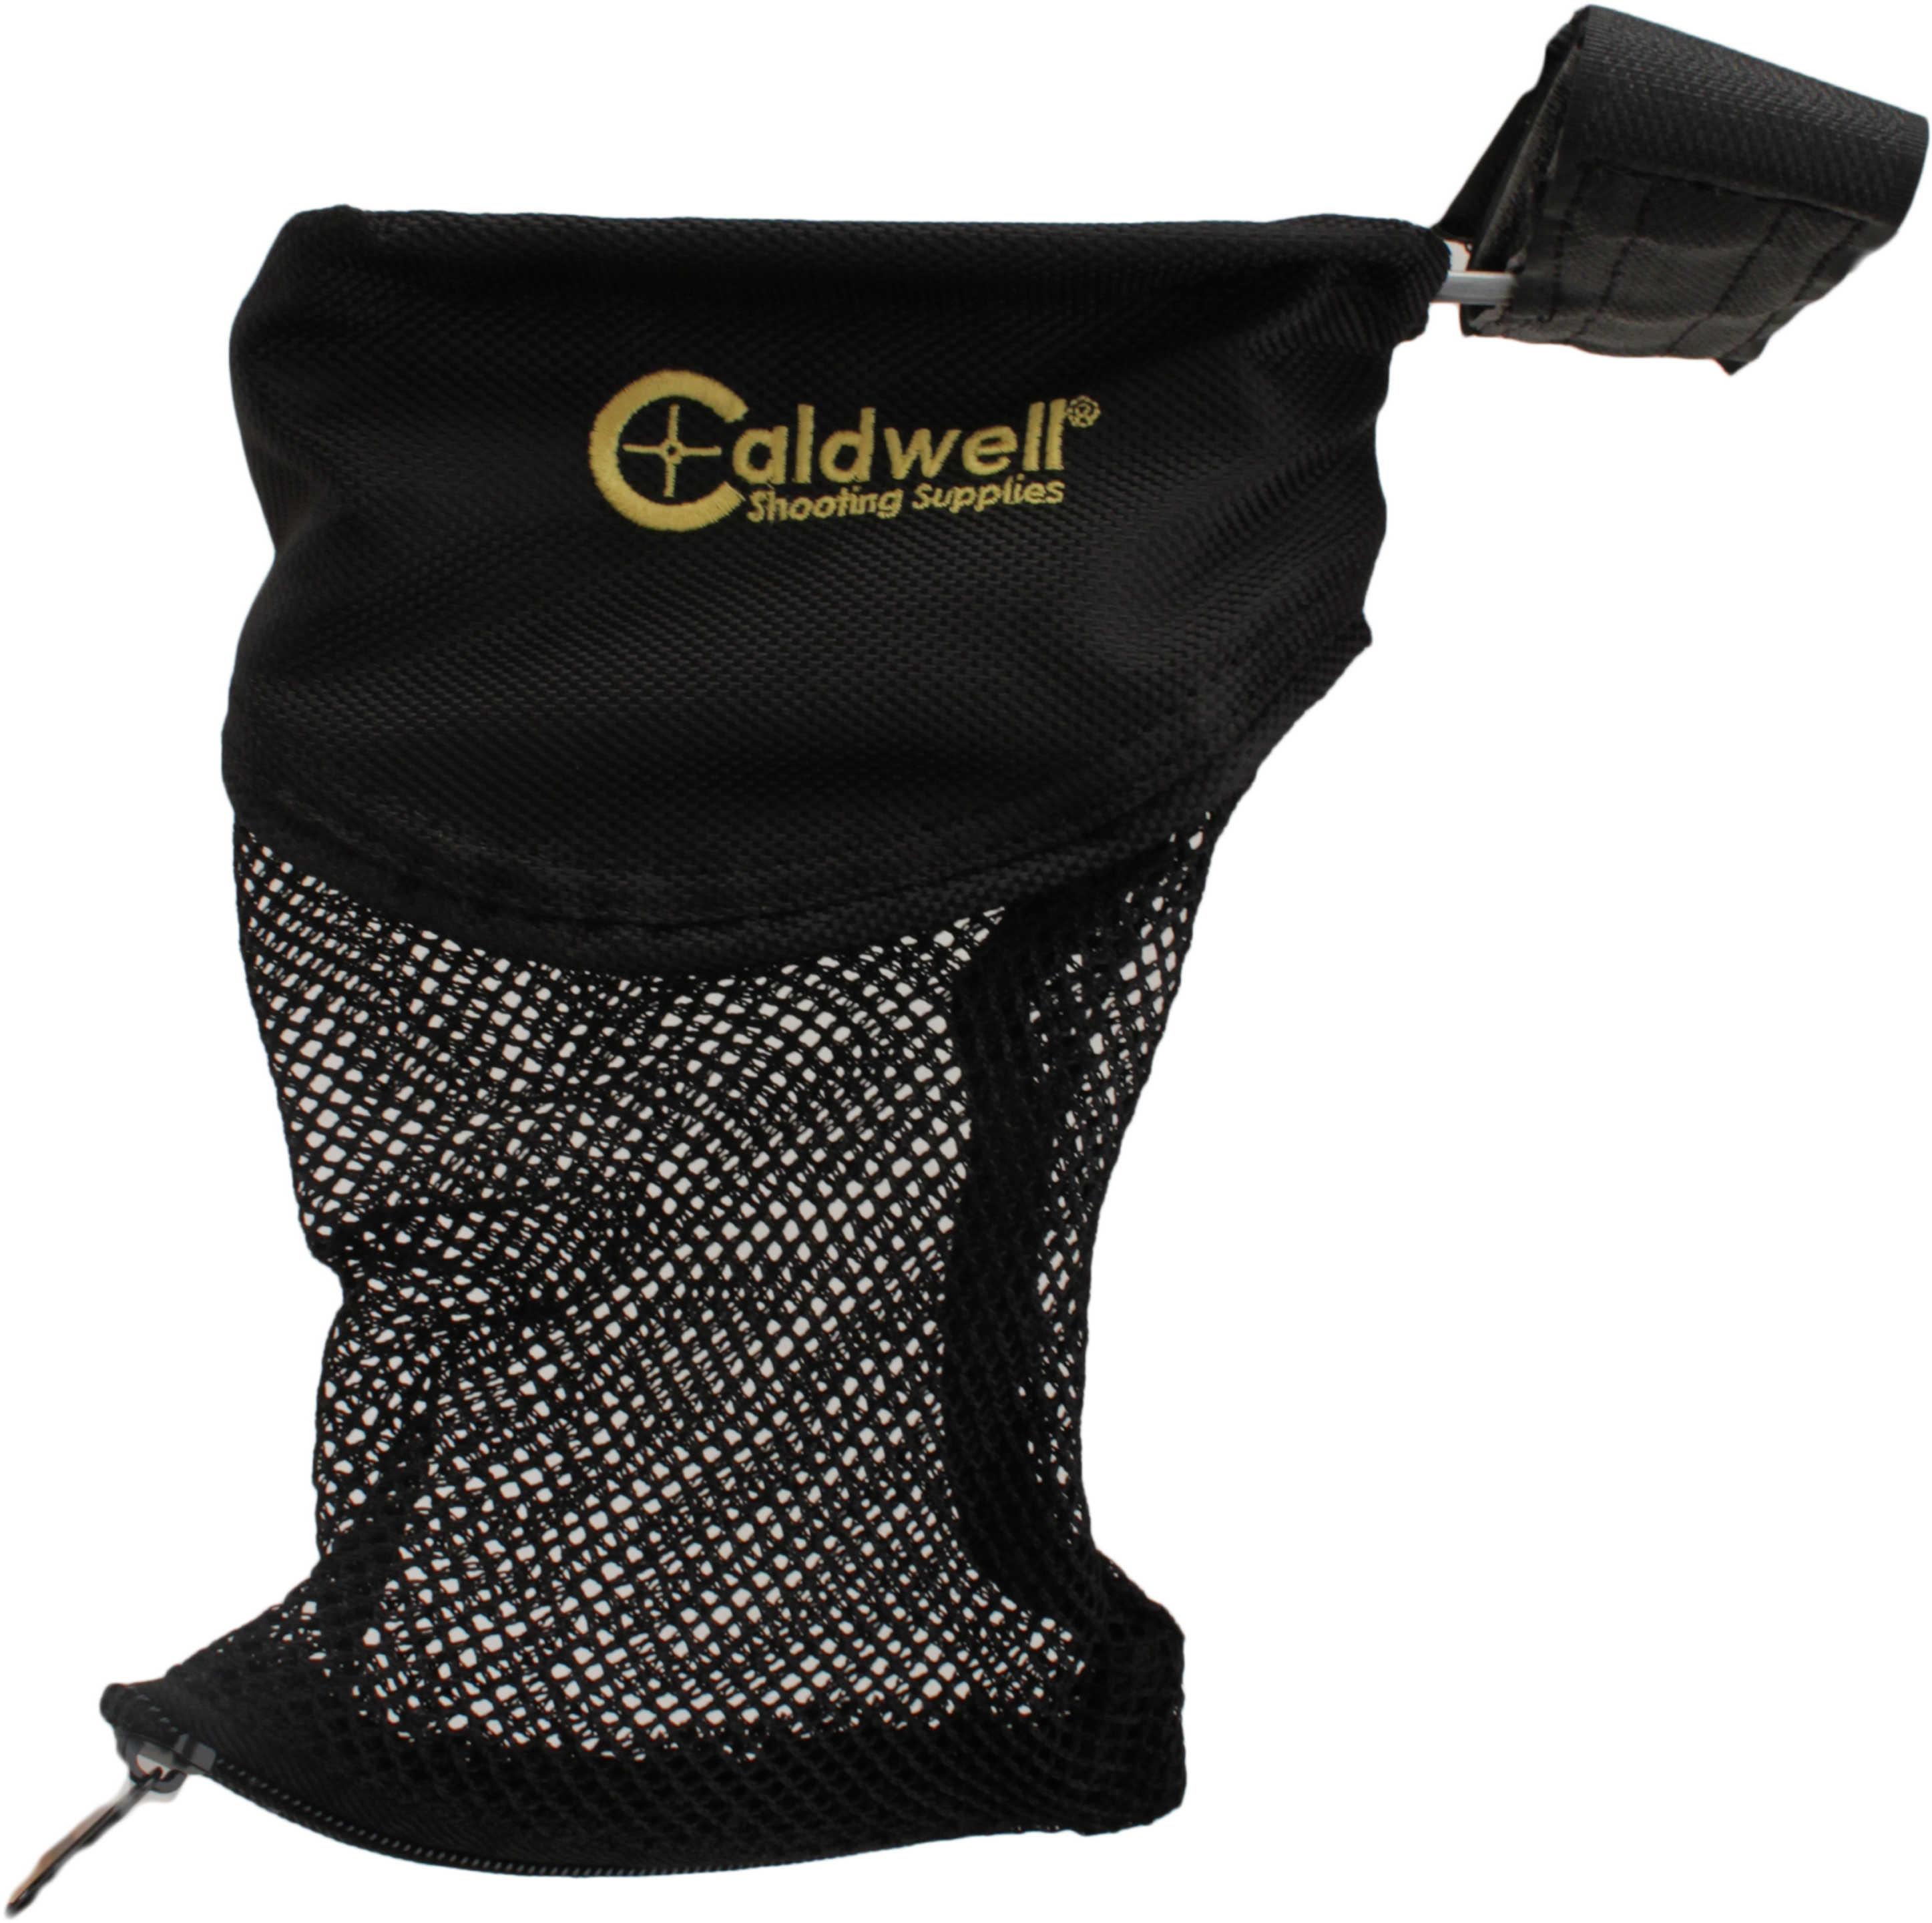 Caldwell AR15 Brass Catcher Hook And Loop Attachment